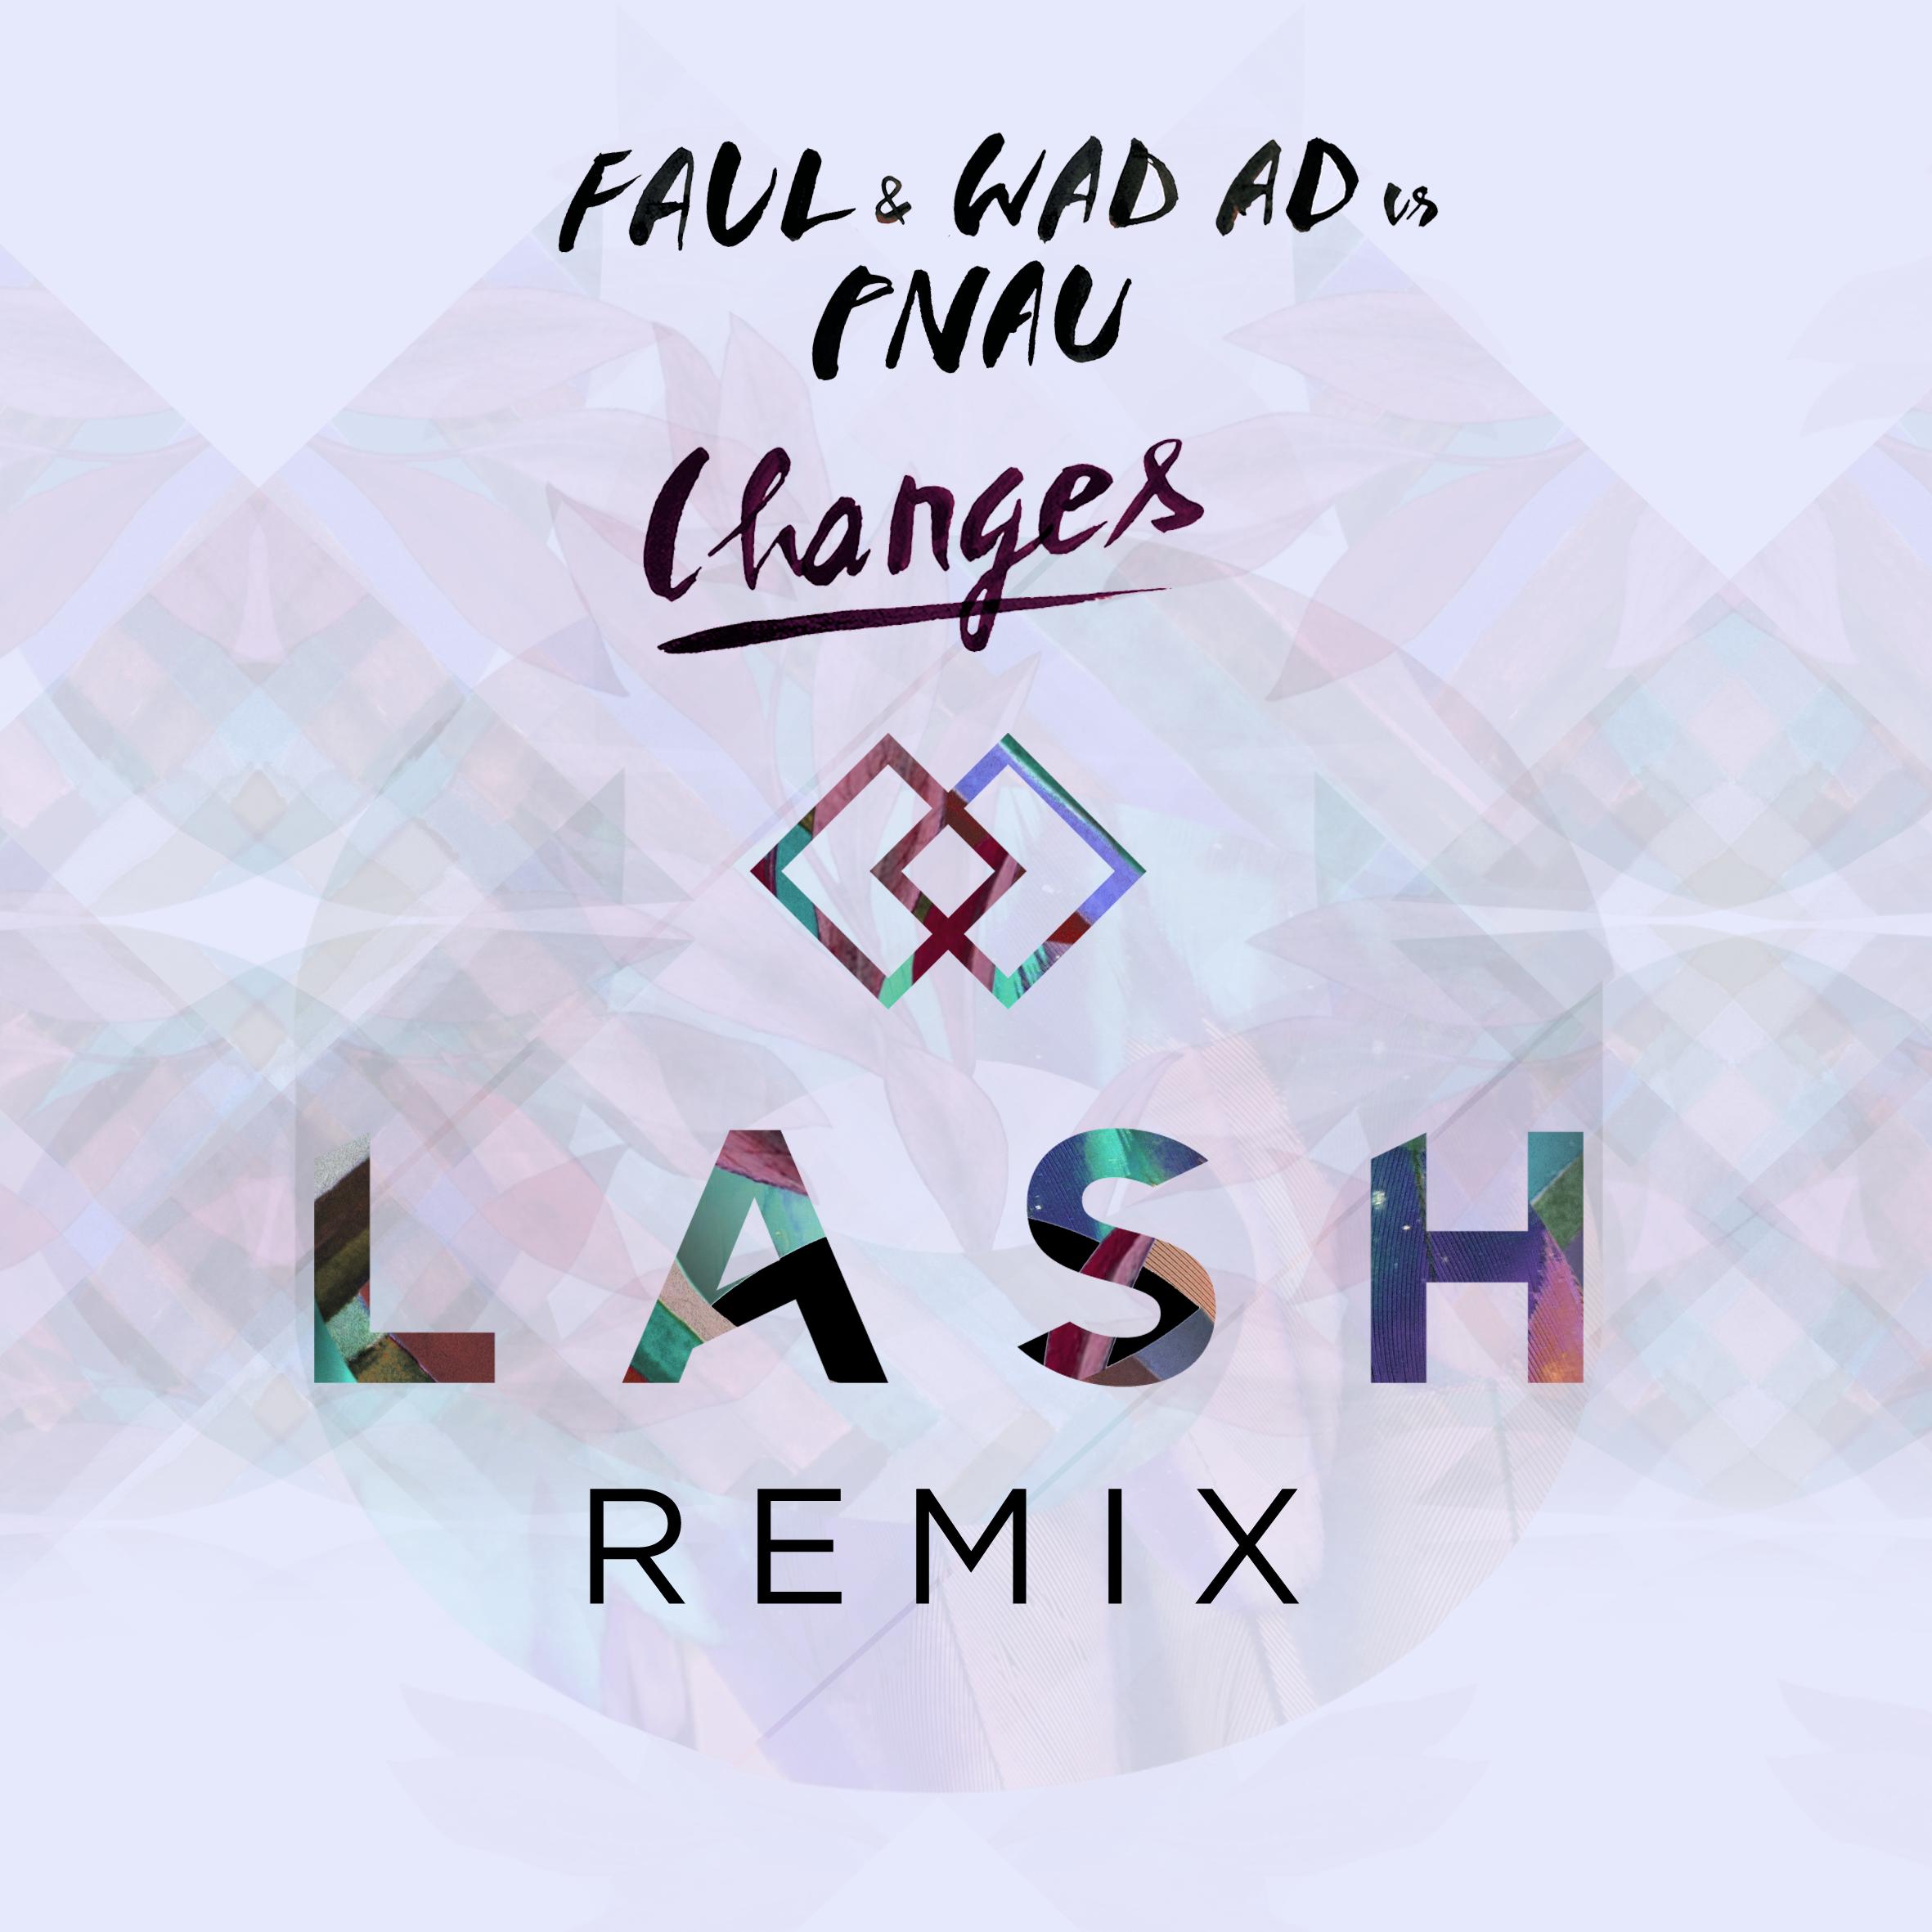 Faul amp wad ad vs pnau changes lash remix free download